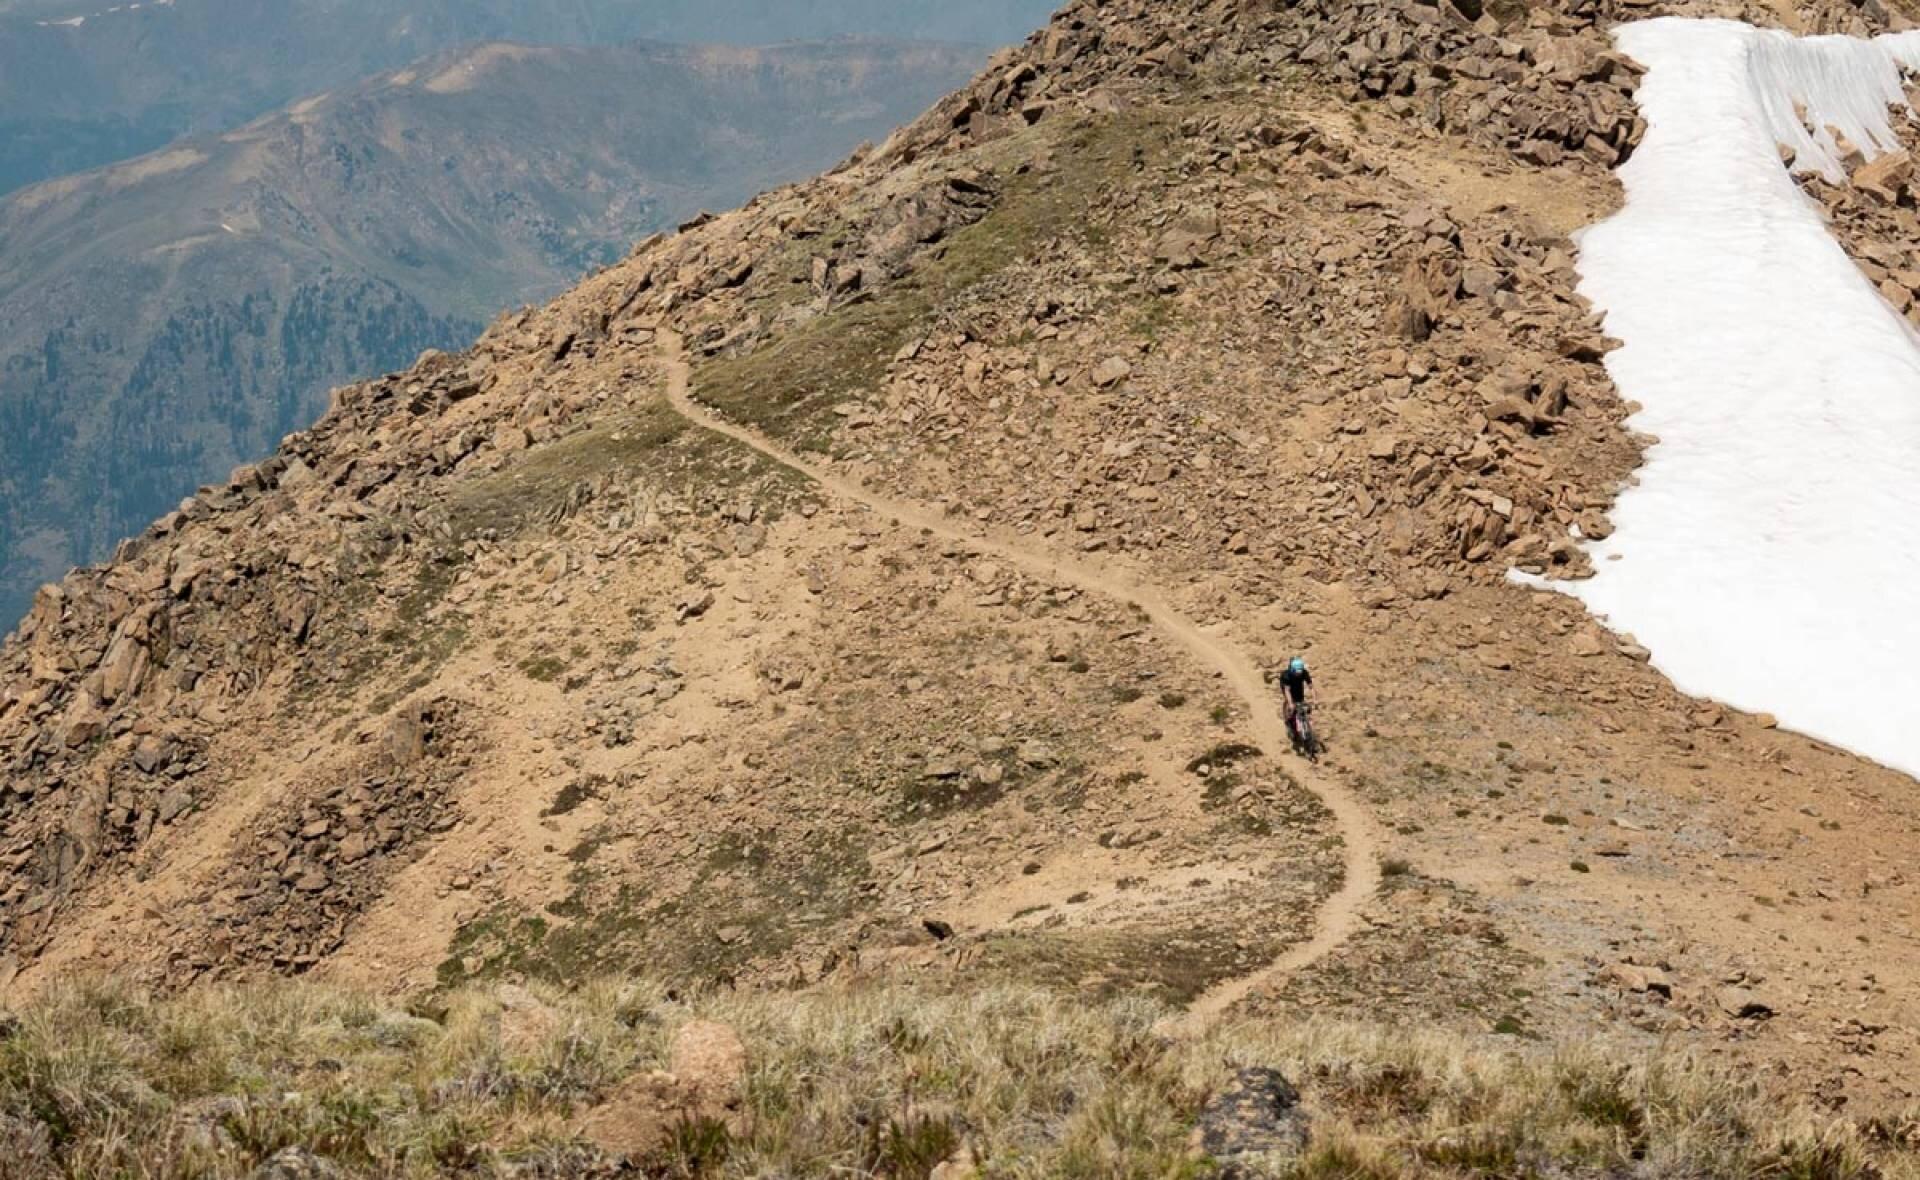 Jones Pass Colorado Gravel Adventure Ride with Rodeo Labs